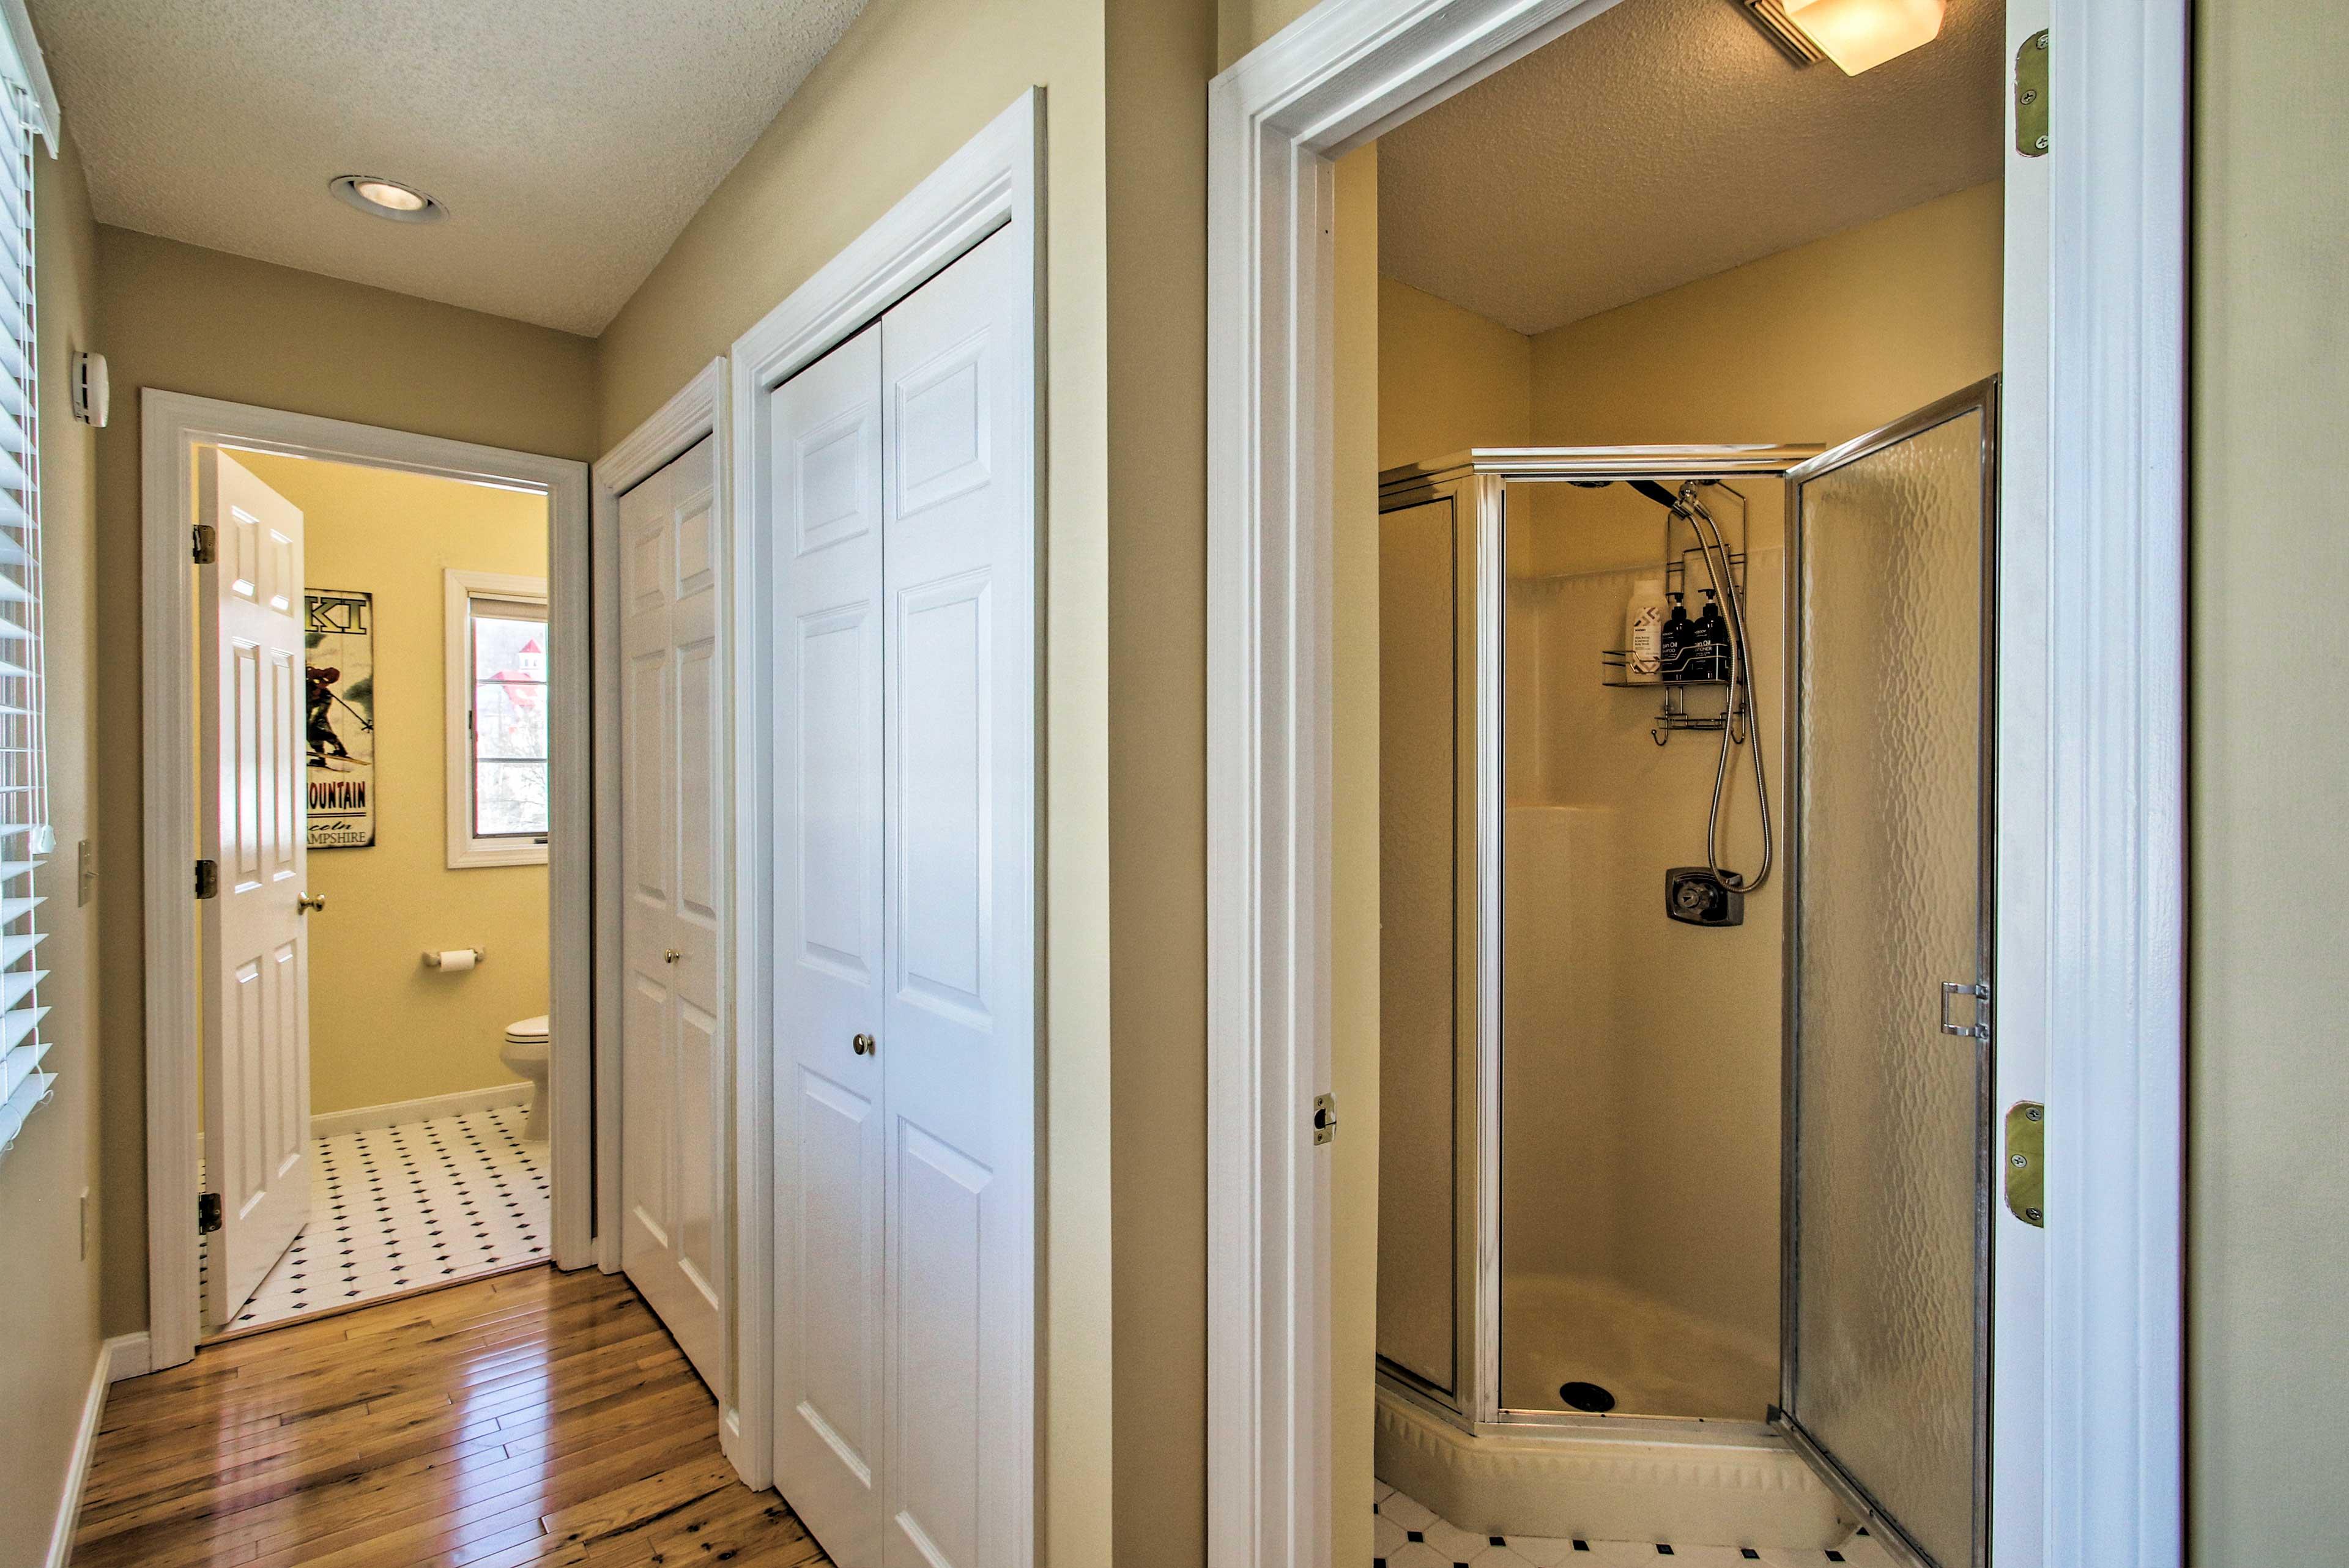 Enjoy ultimate privacy with the en-suite bathroom.